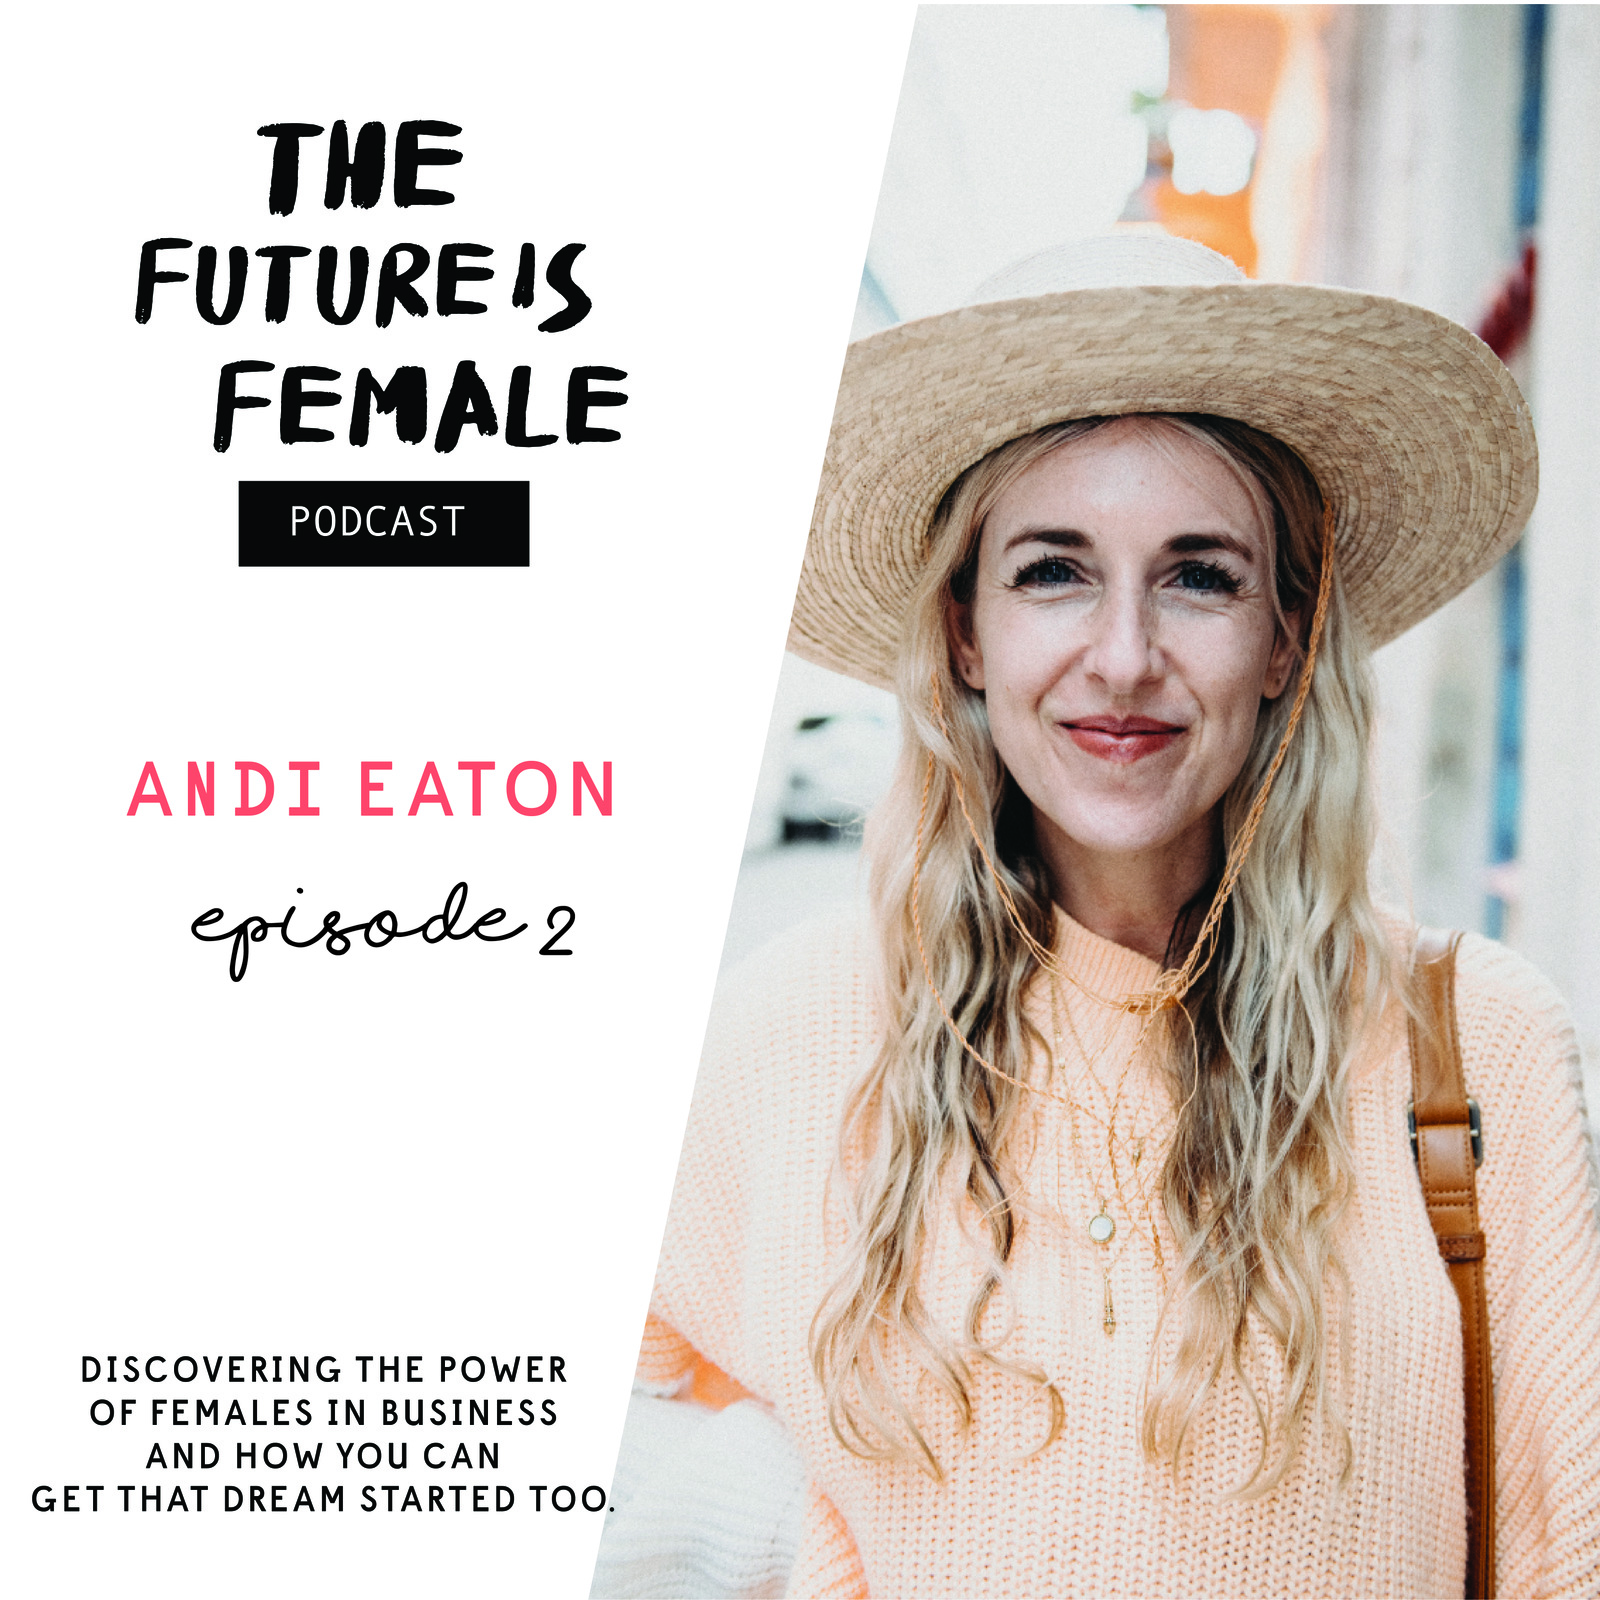 The future is Female Podcast Andi Eaton